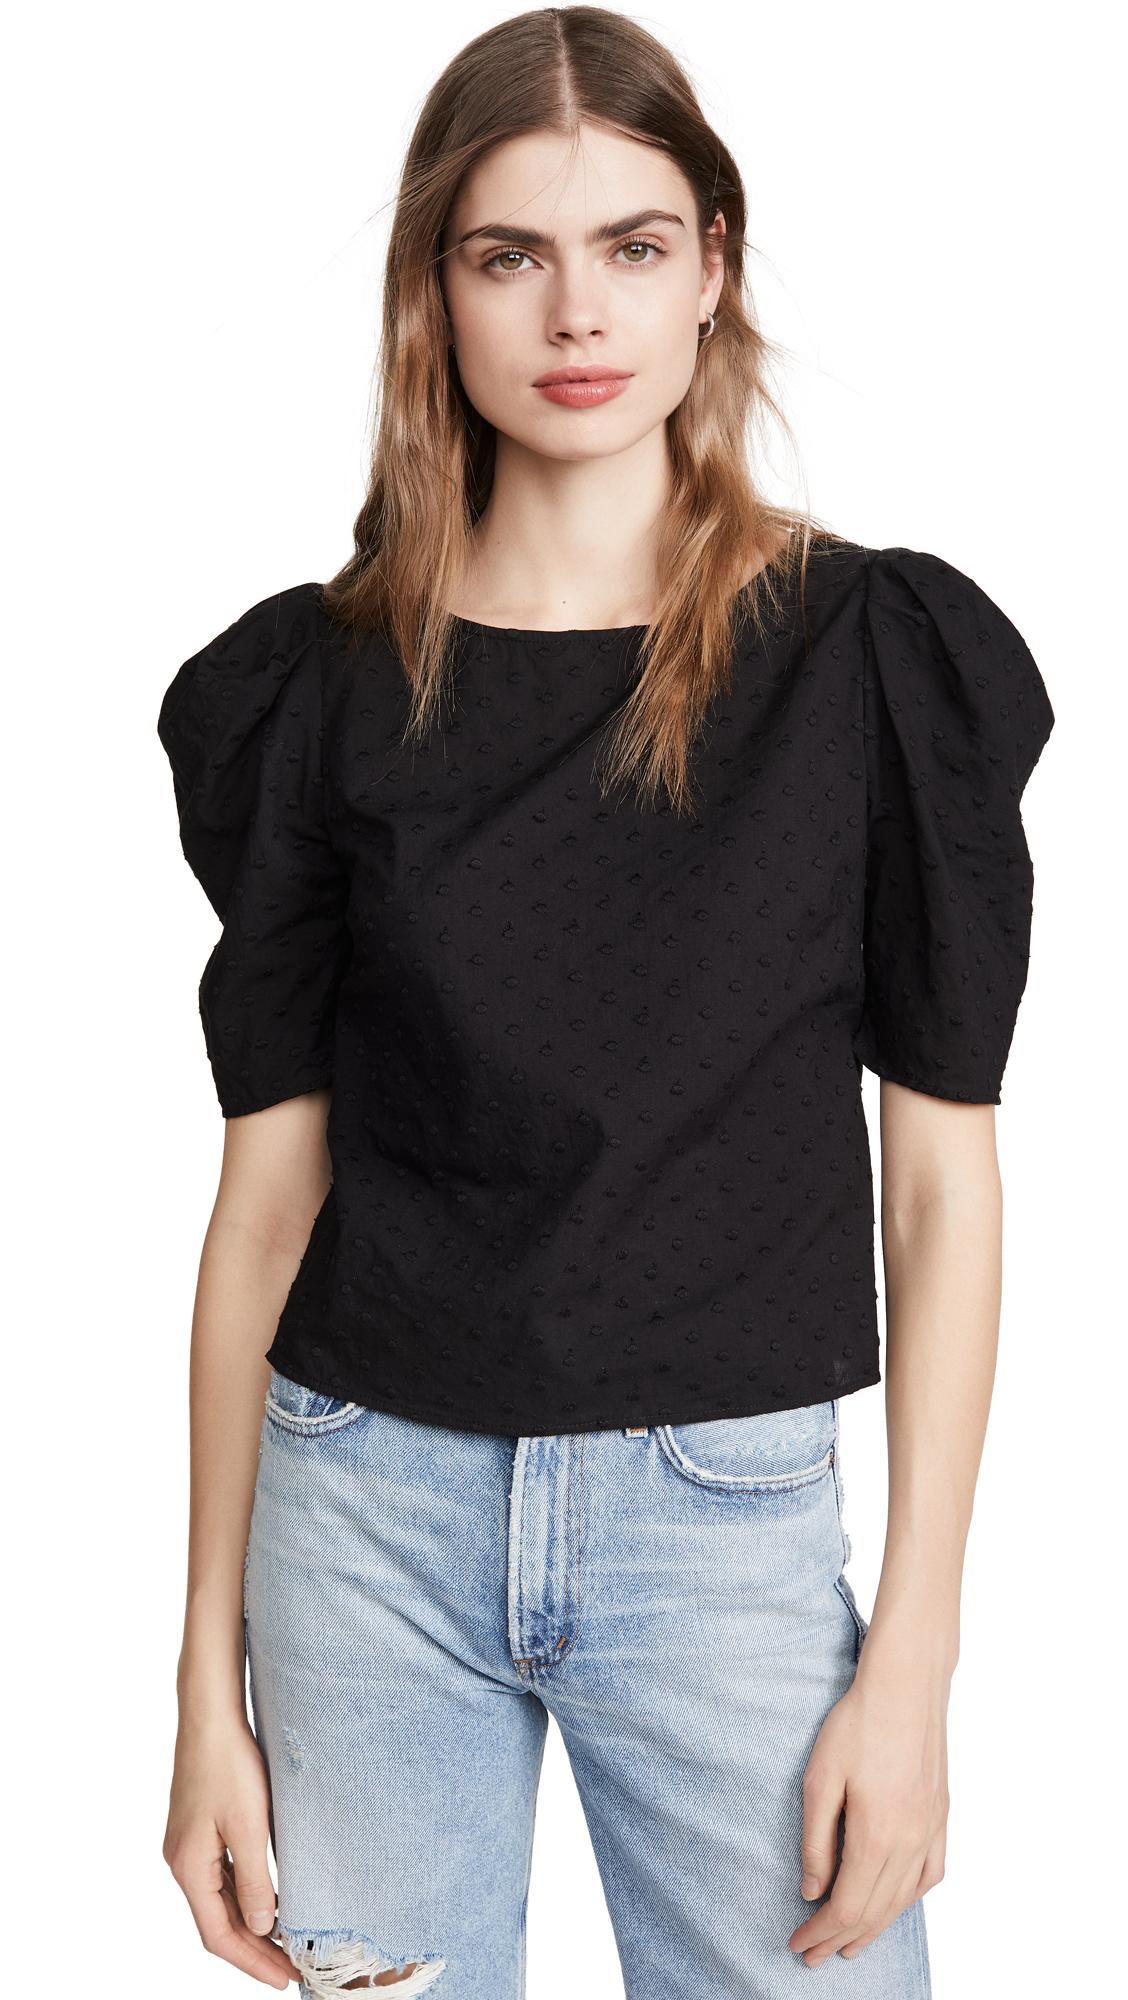 BB Dakota Swiss Dot Puff Sleeve Top - 30% Off Sale